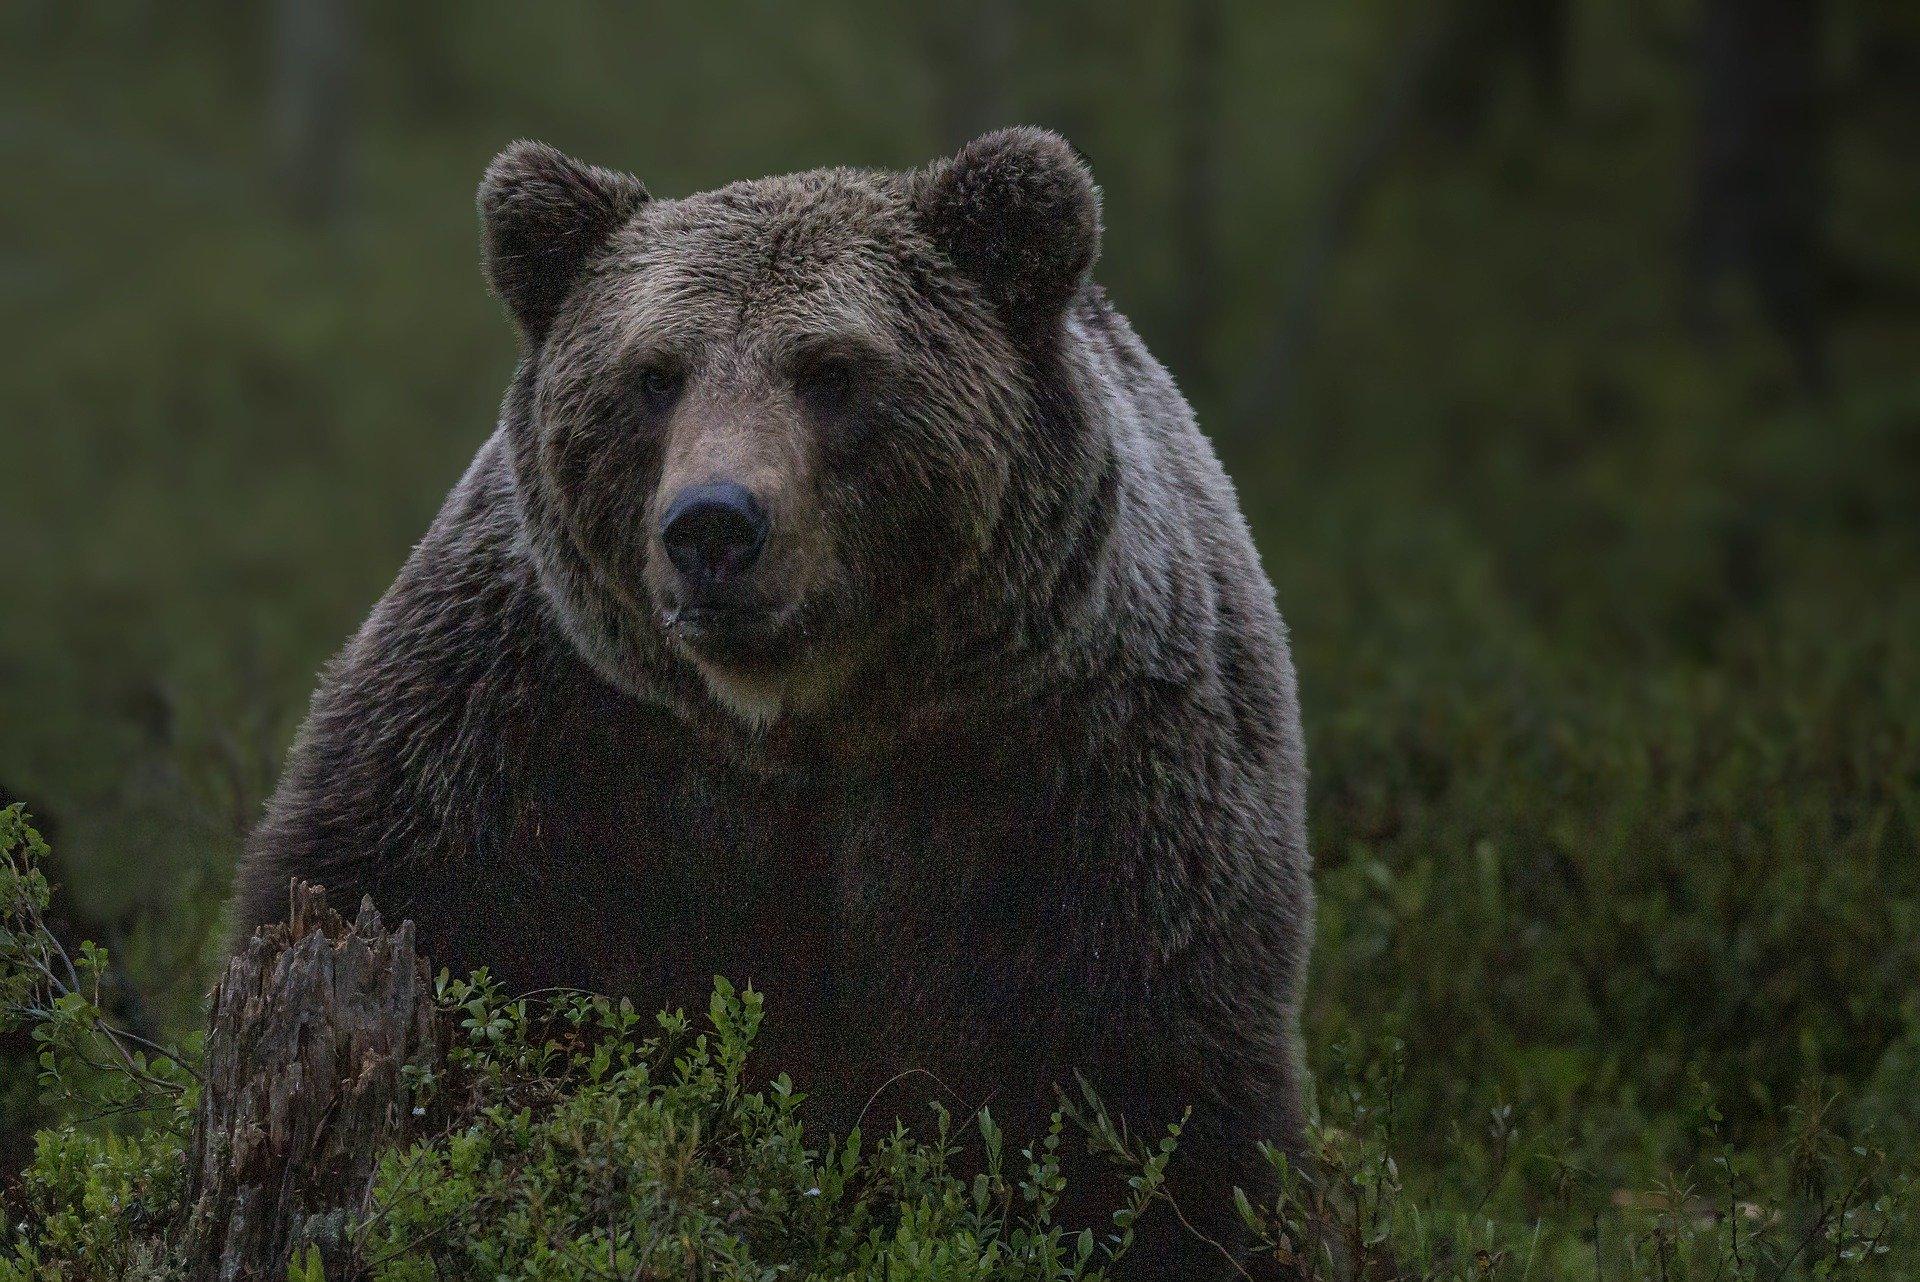 ग्रामीण के पीछे दौड़ा भालू, भागकर जान बचाई